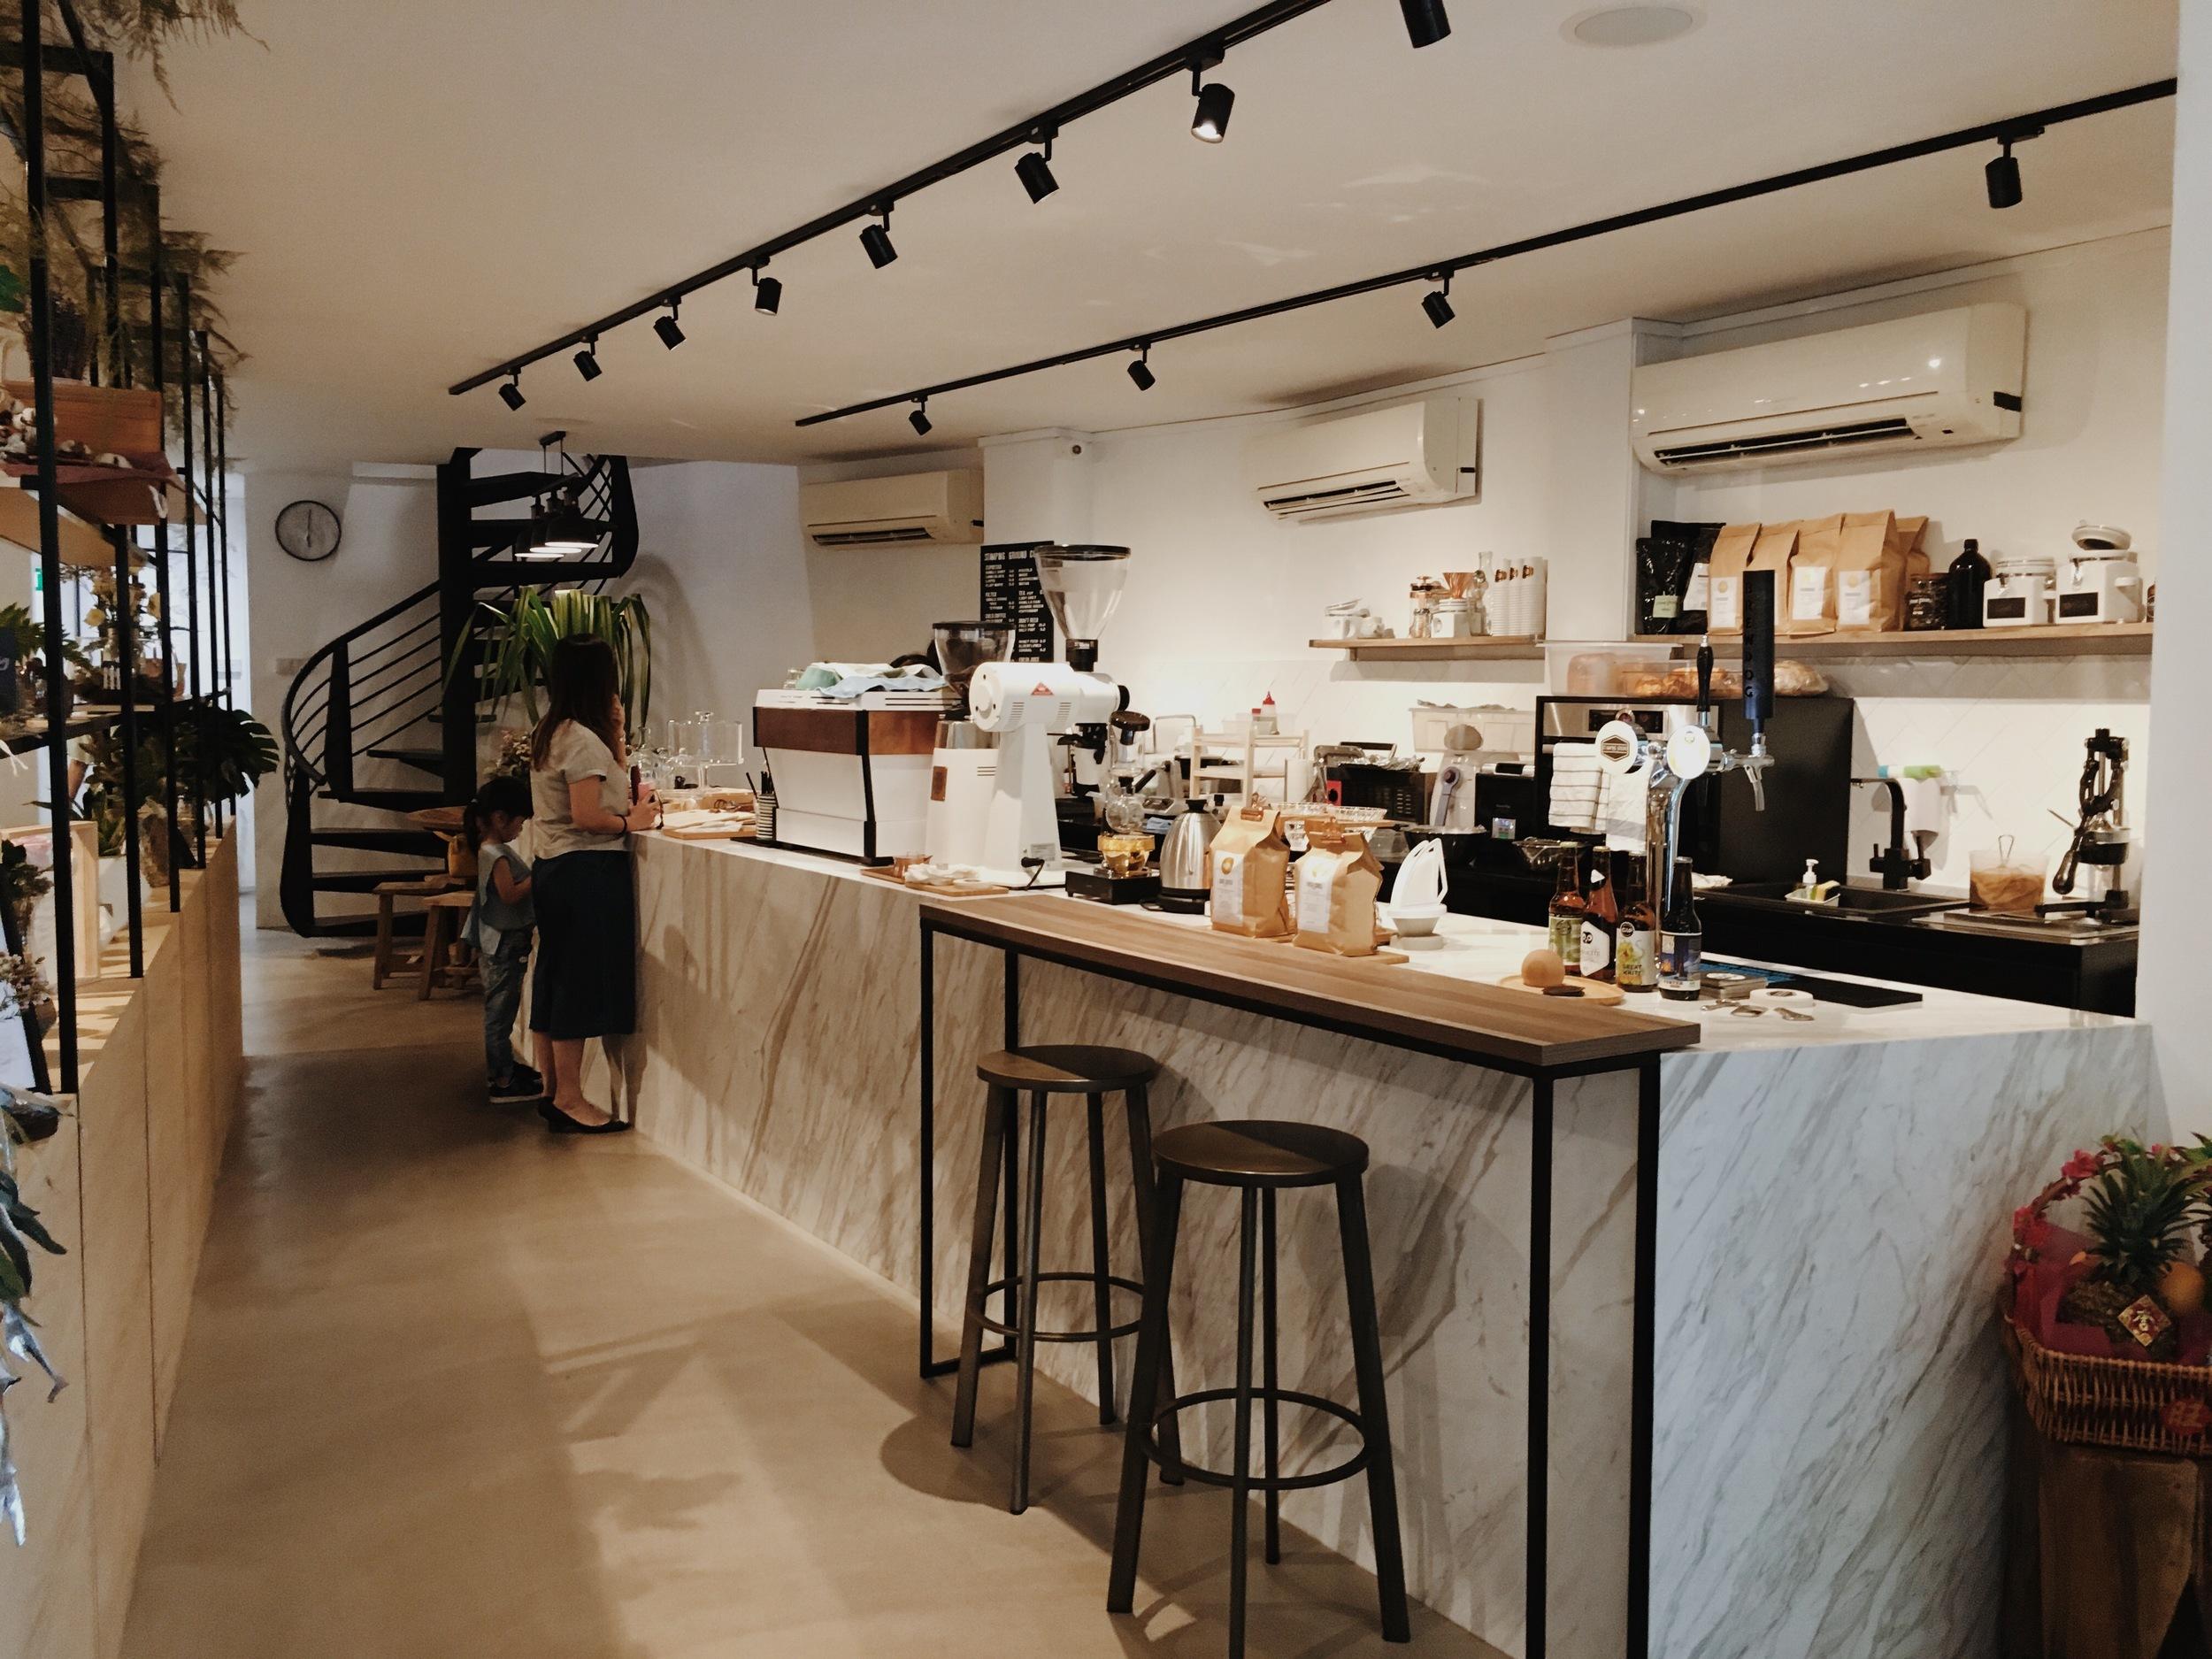 Stamping+Ground+Coffee+-+4.jpeg